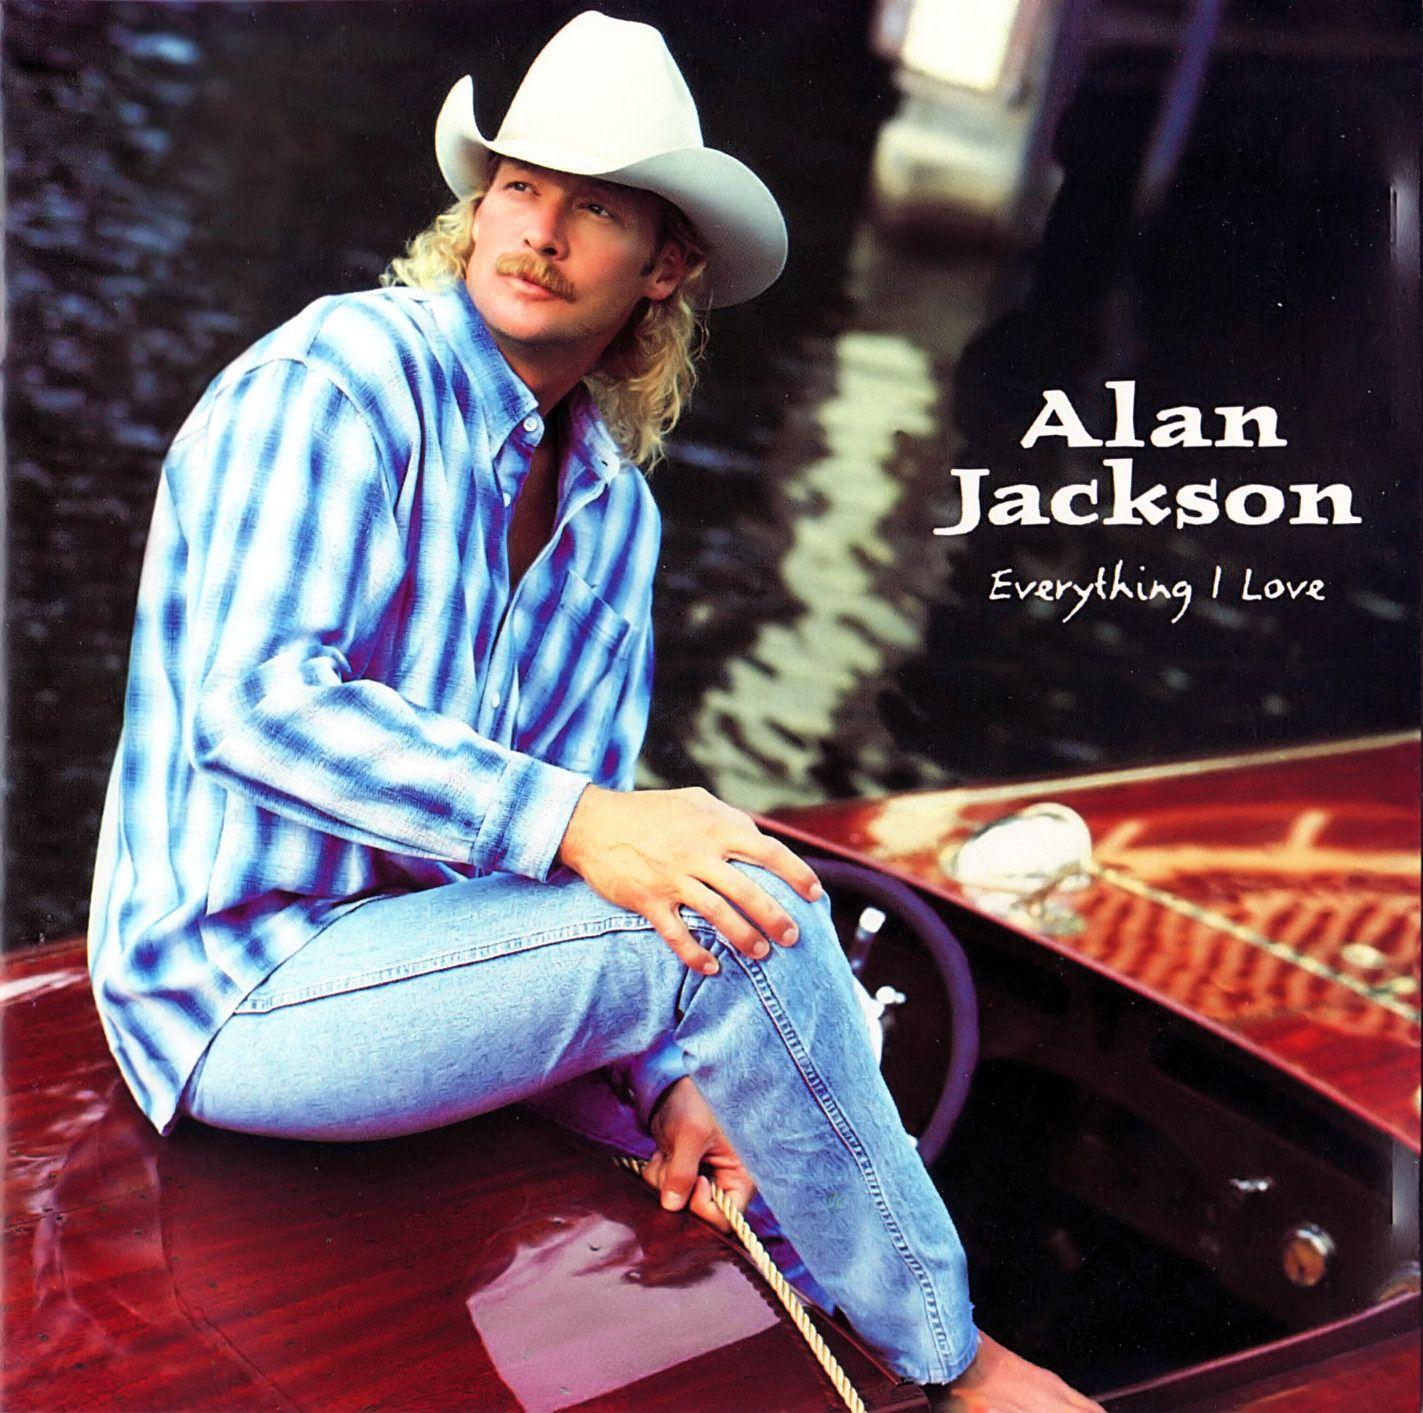 Alan Jackson - Everything I Love - Album Cover